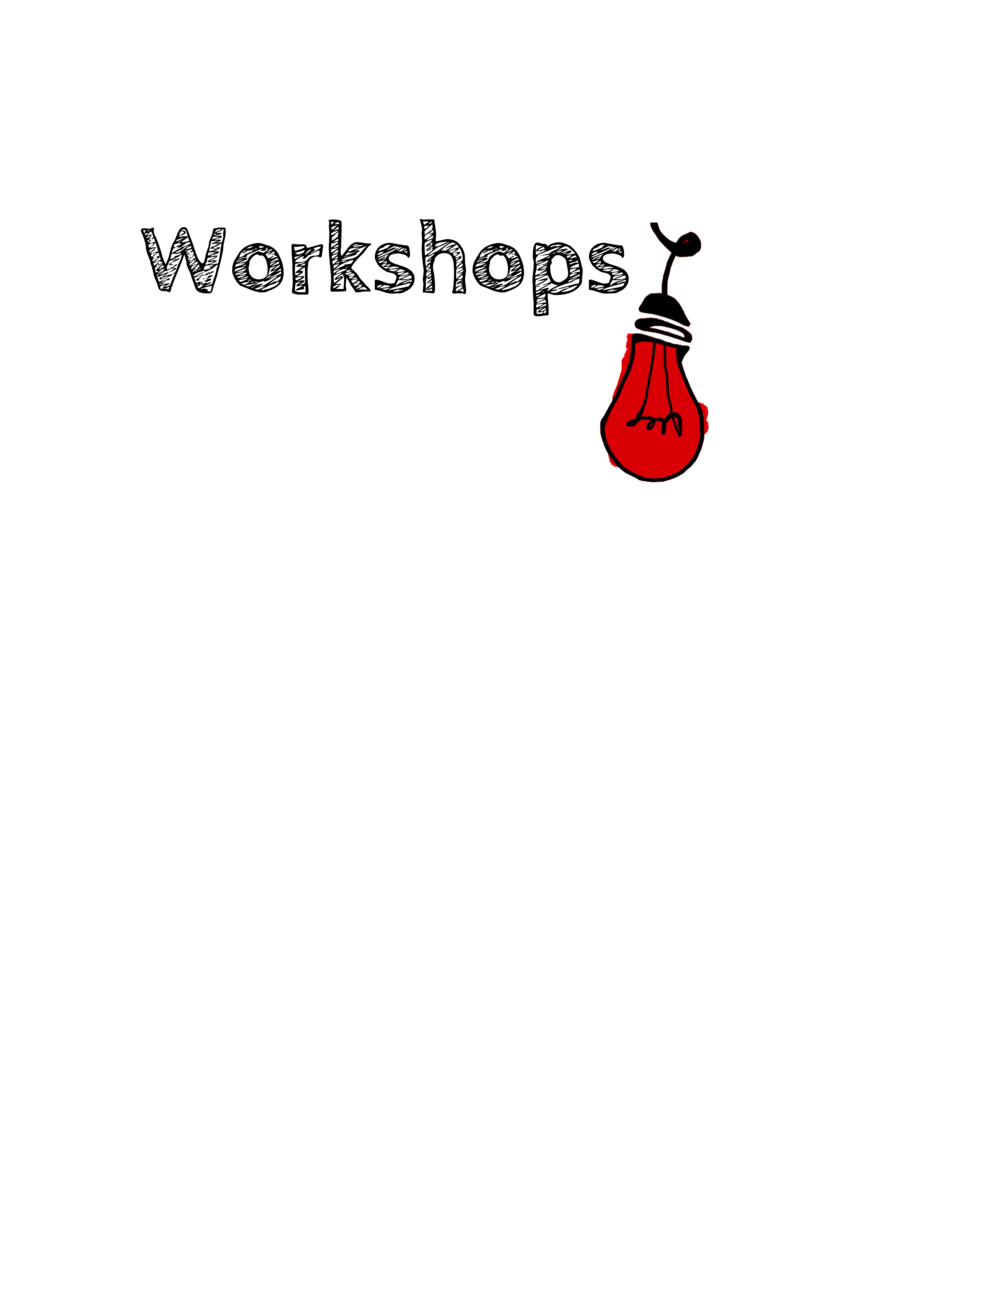 imgres-1.jpg